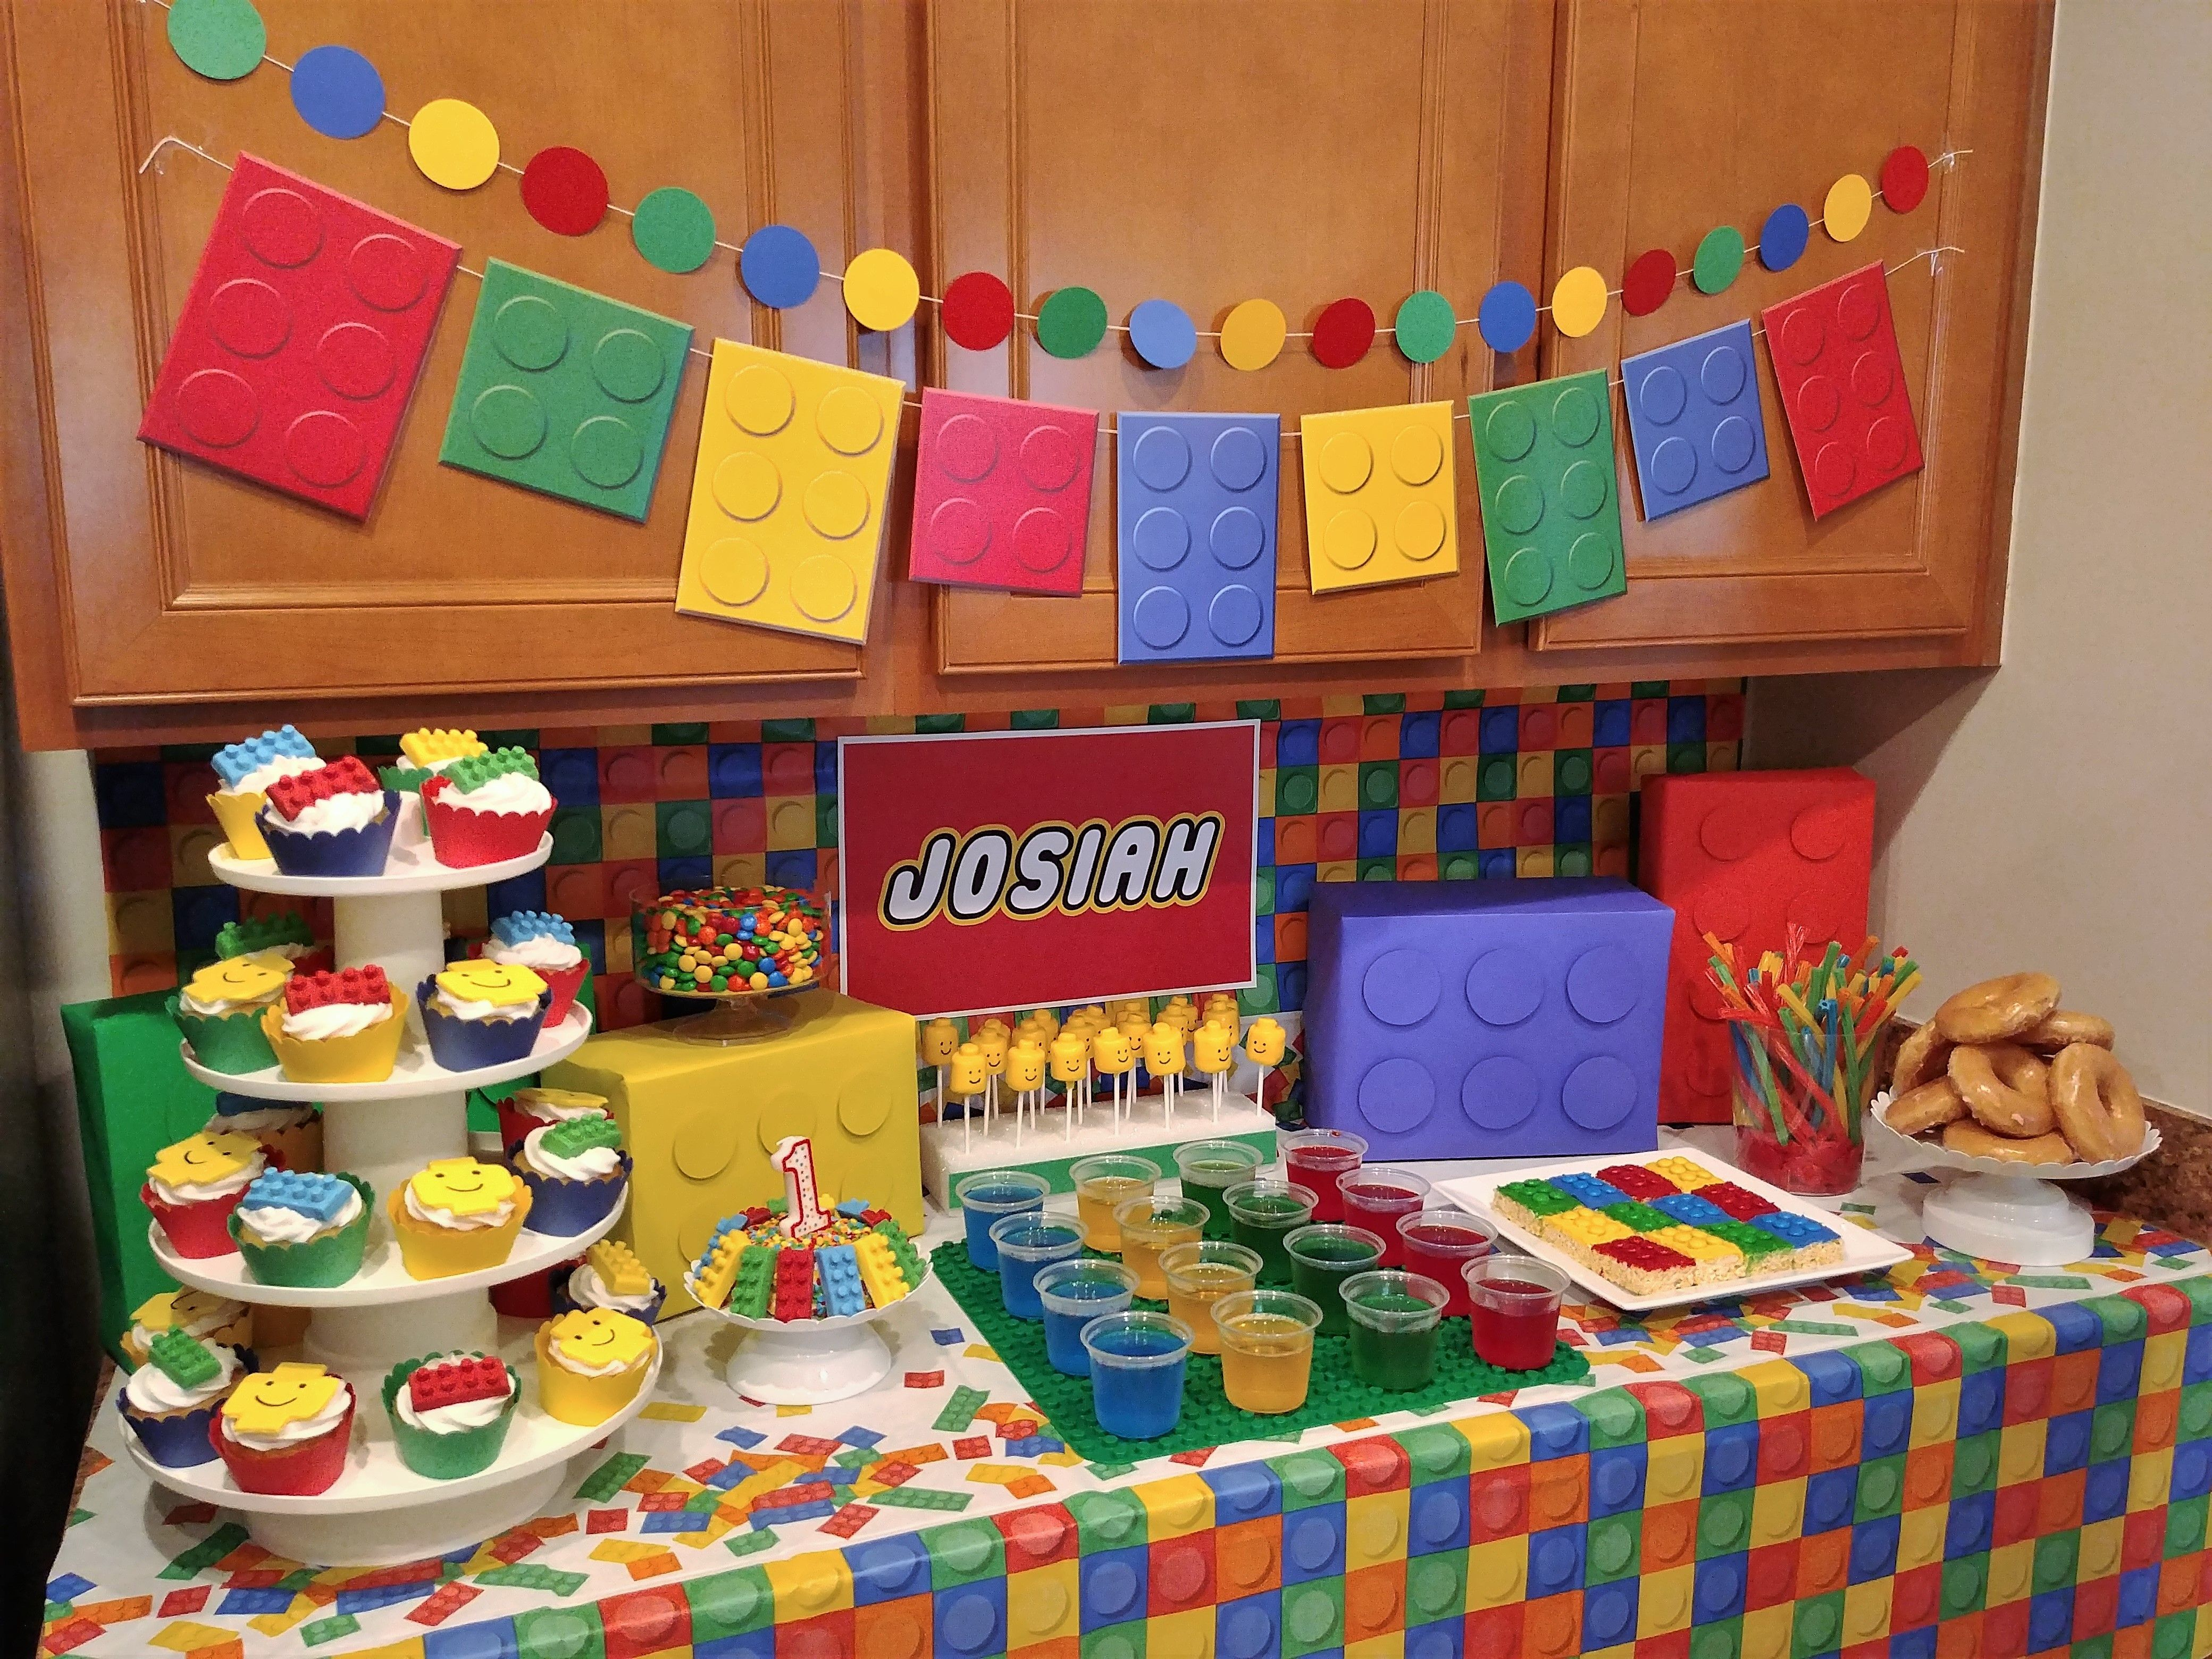 Lego First Birthday Party Lego Bricks Party Lego Birthday Party